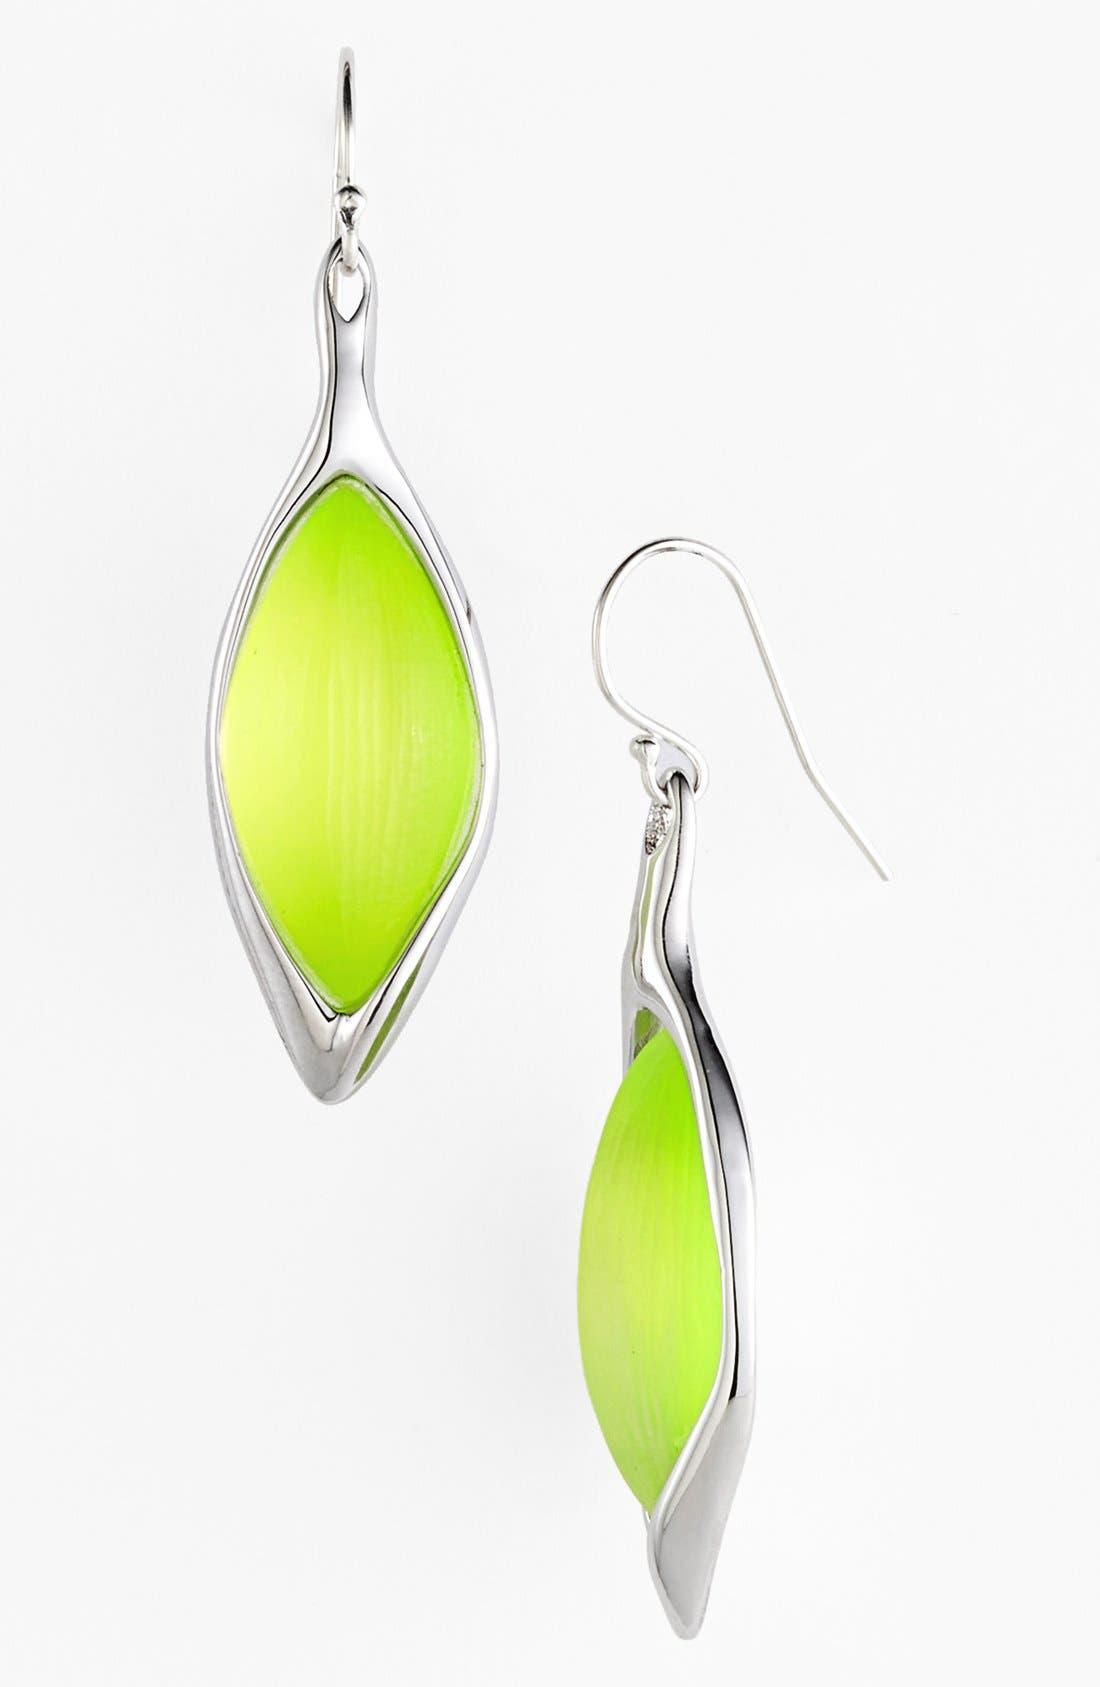 Main Image - Alexis Bittar 'Lucite® - Neon Deco' Drop Earrings